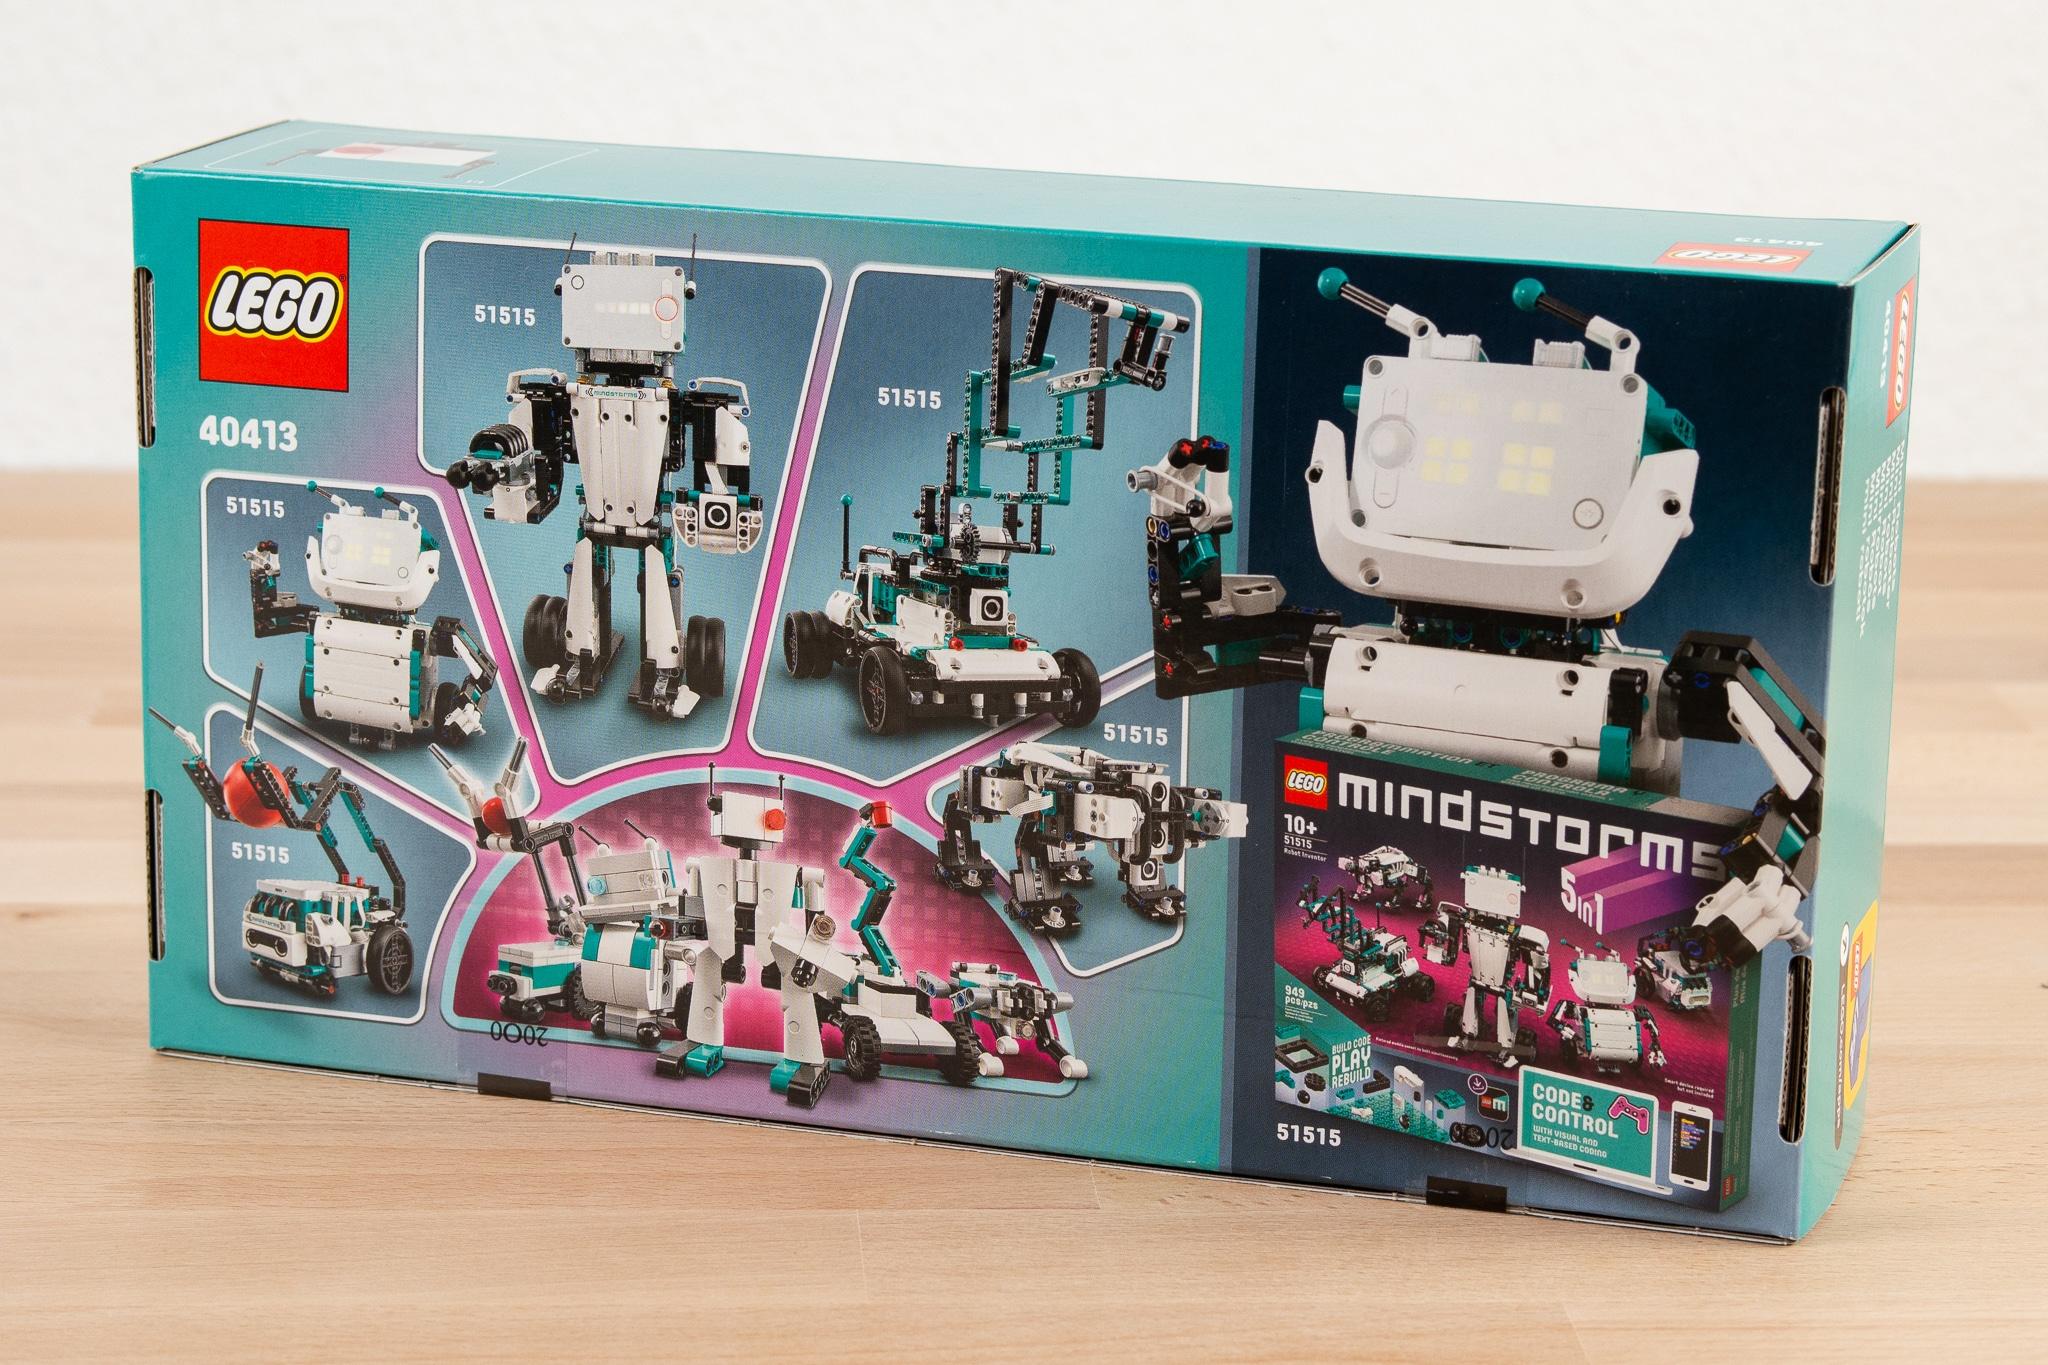 LEGO 40413 Mindstorms Mini Roboter Box (3)